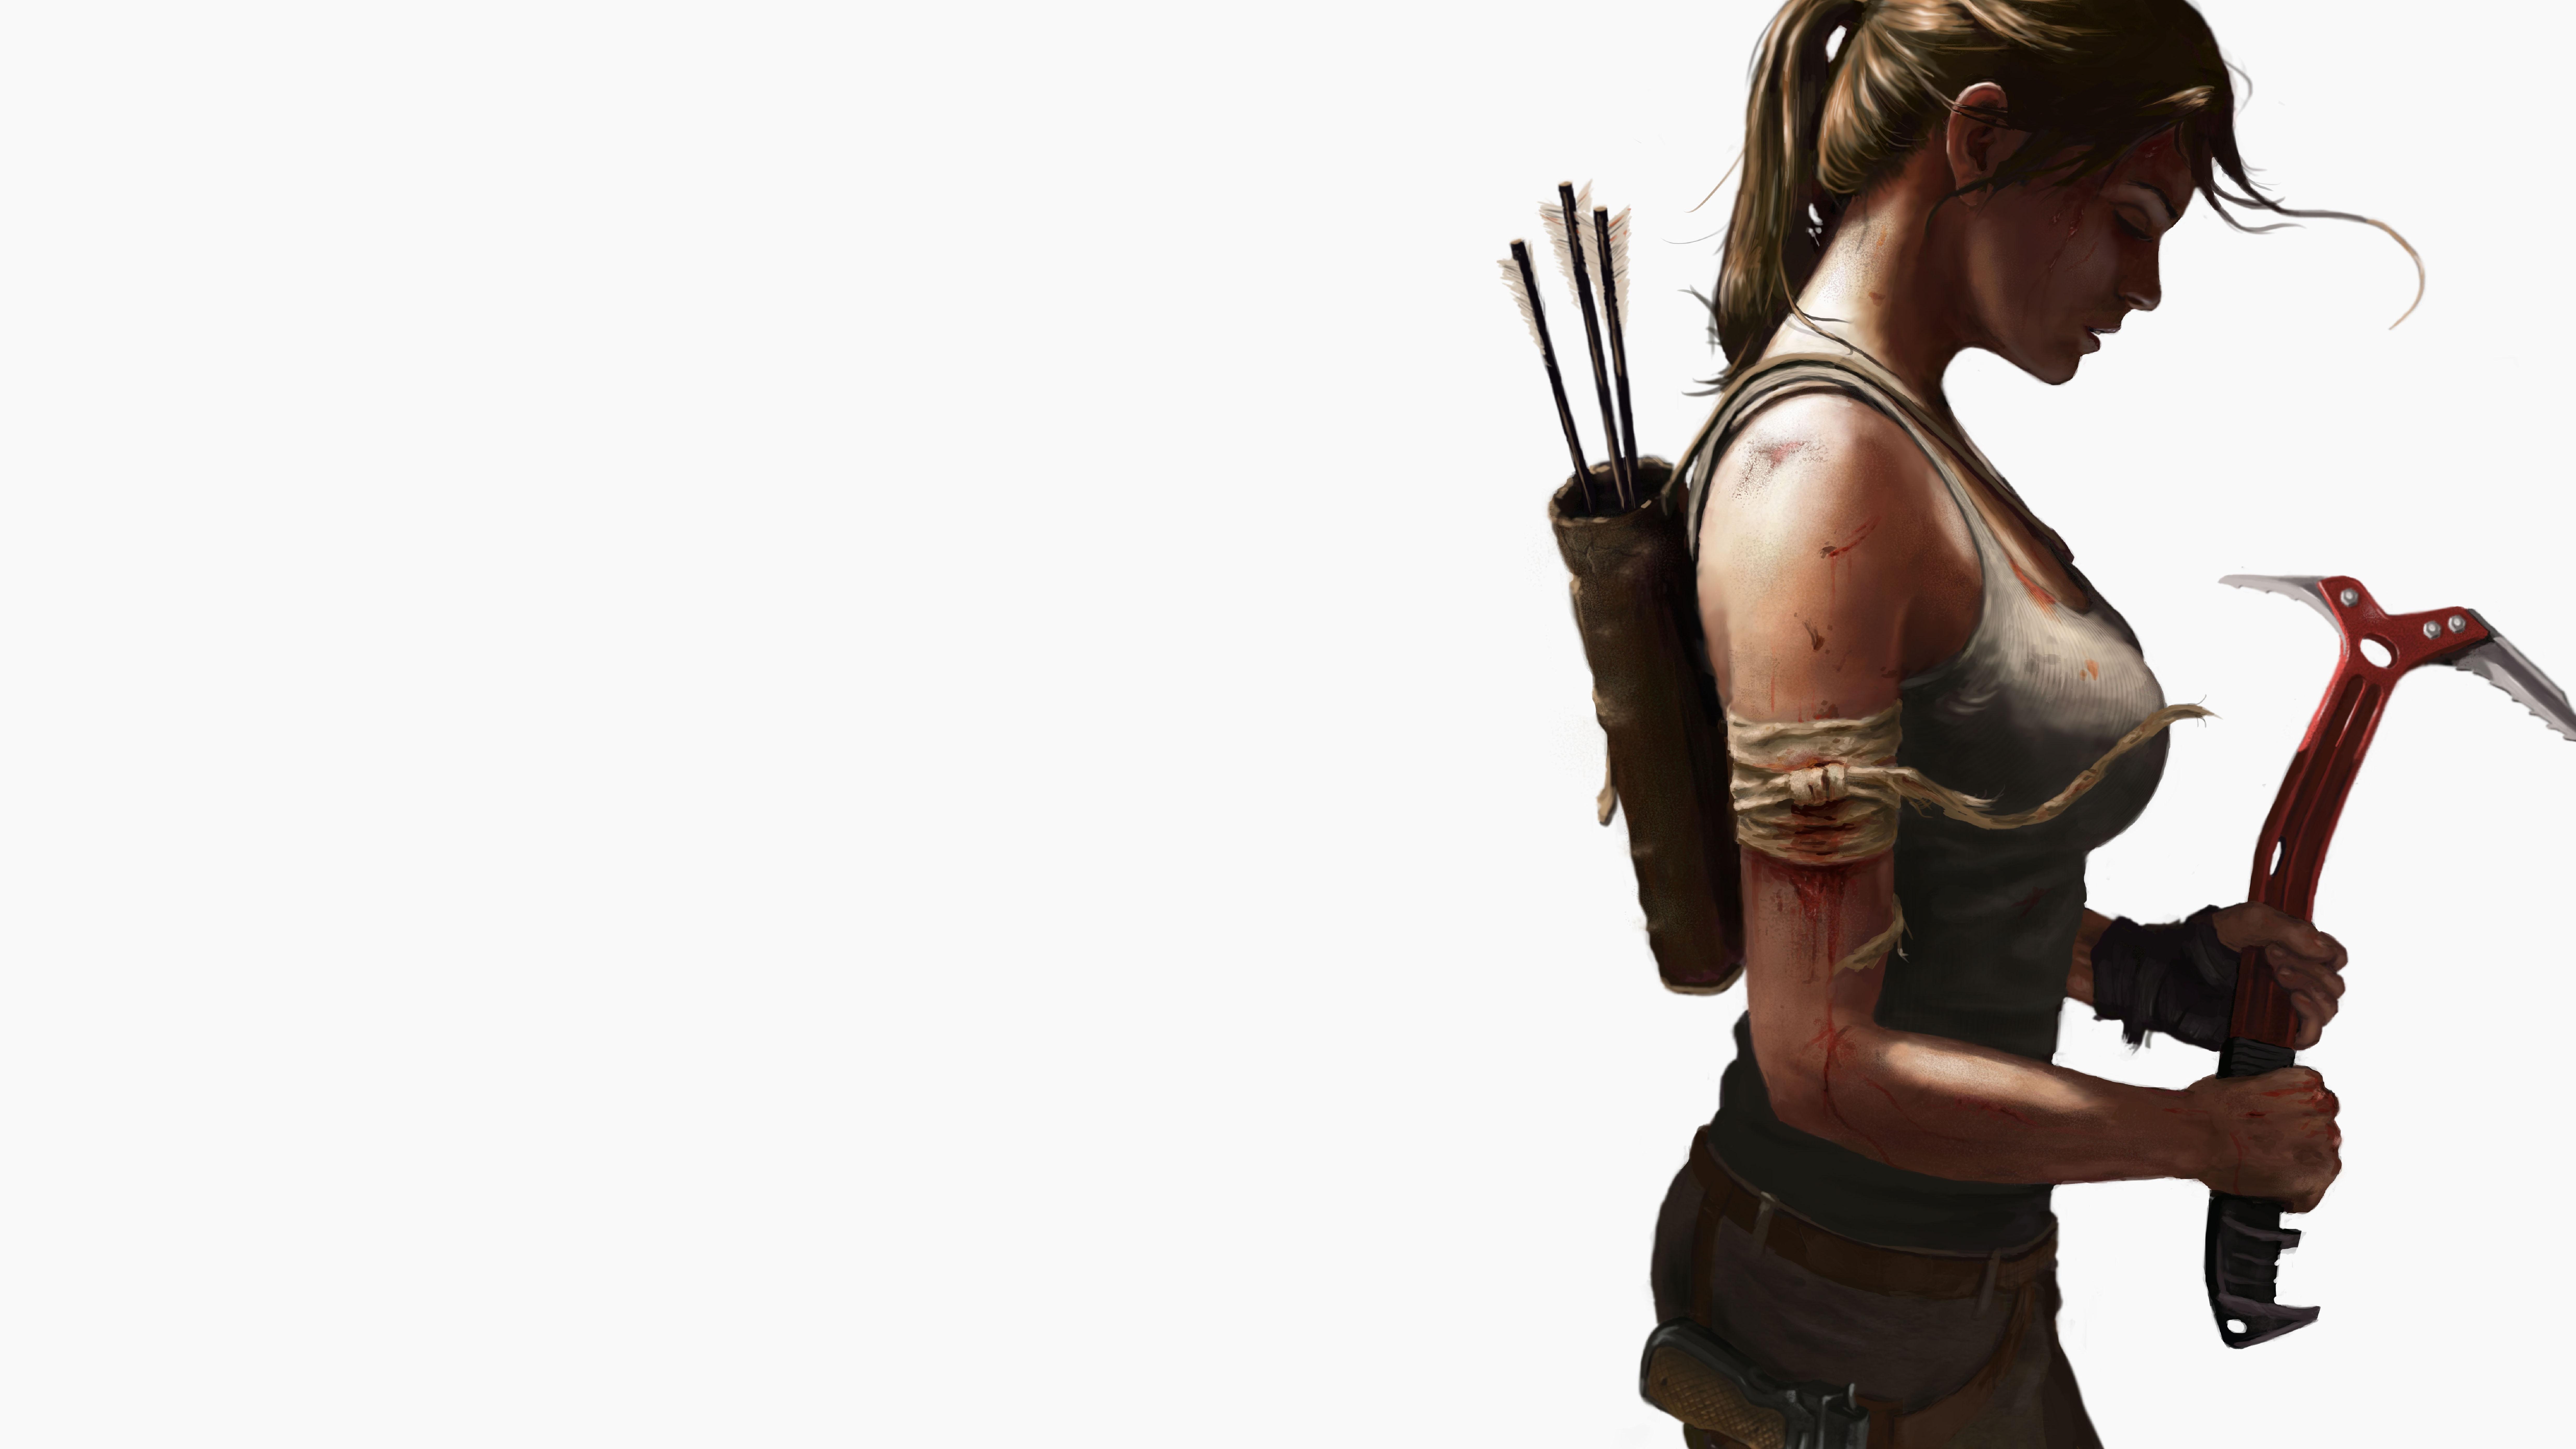 8k Tomb Raider Lara Croft, HD Games, 4k Wallpapers, Images